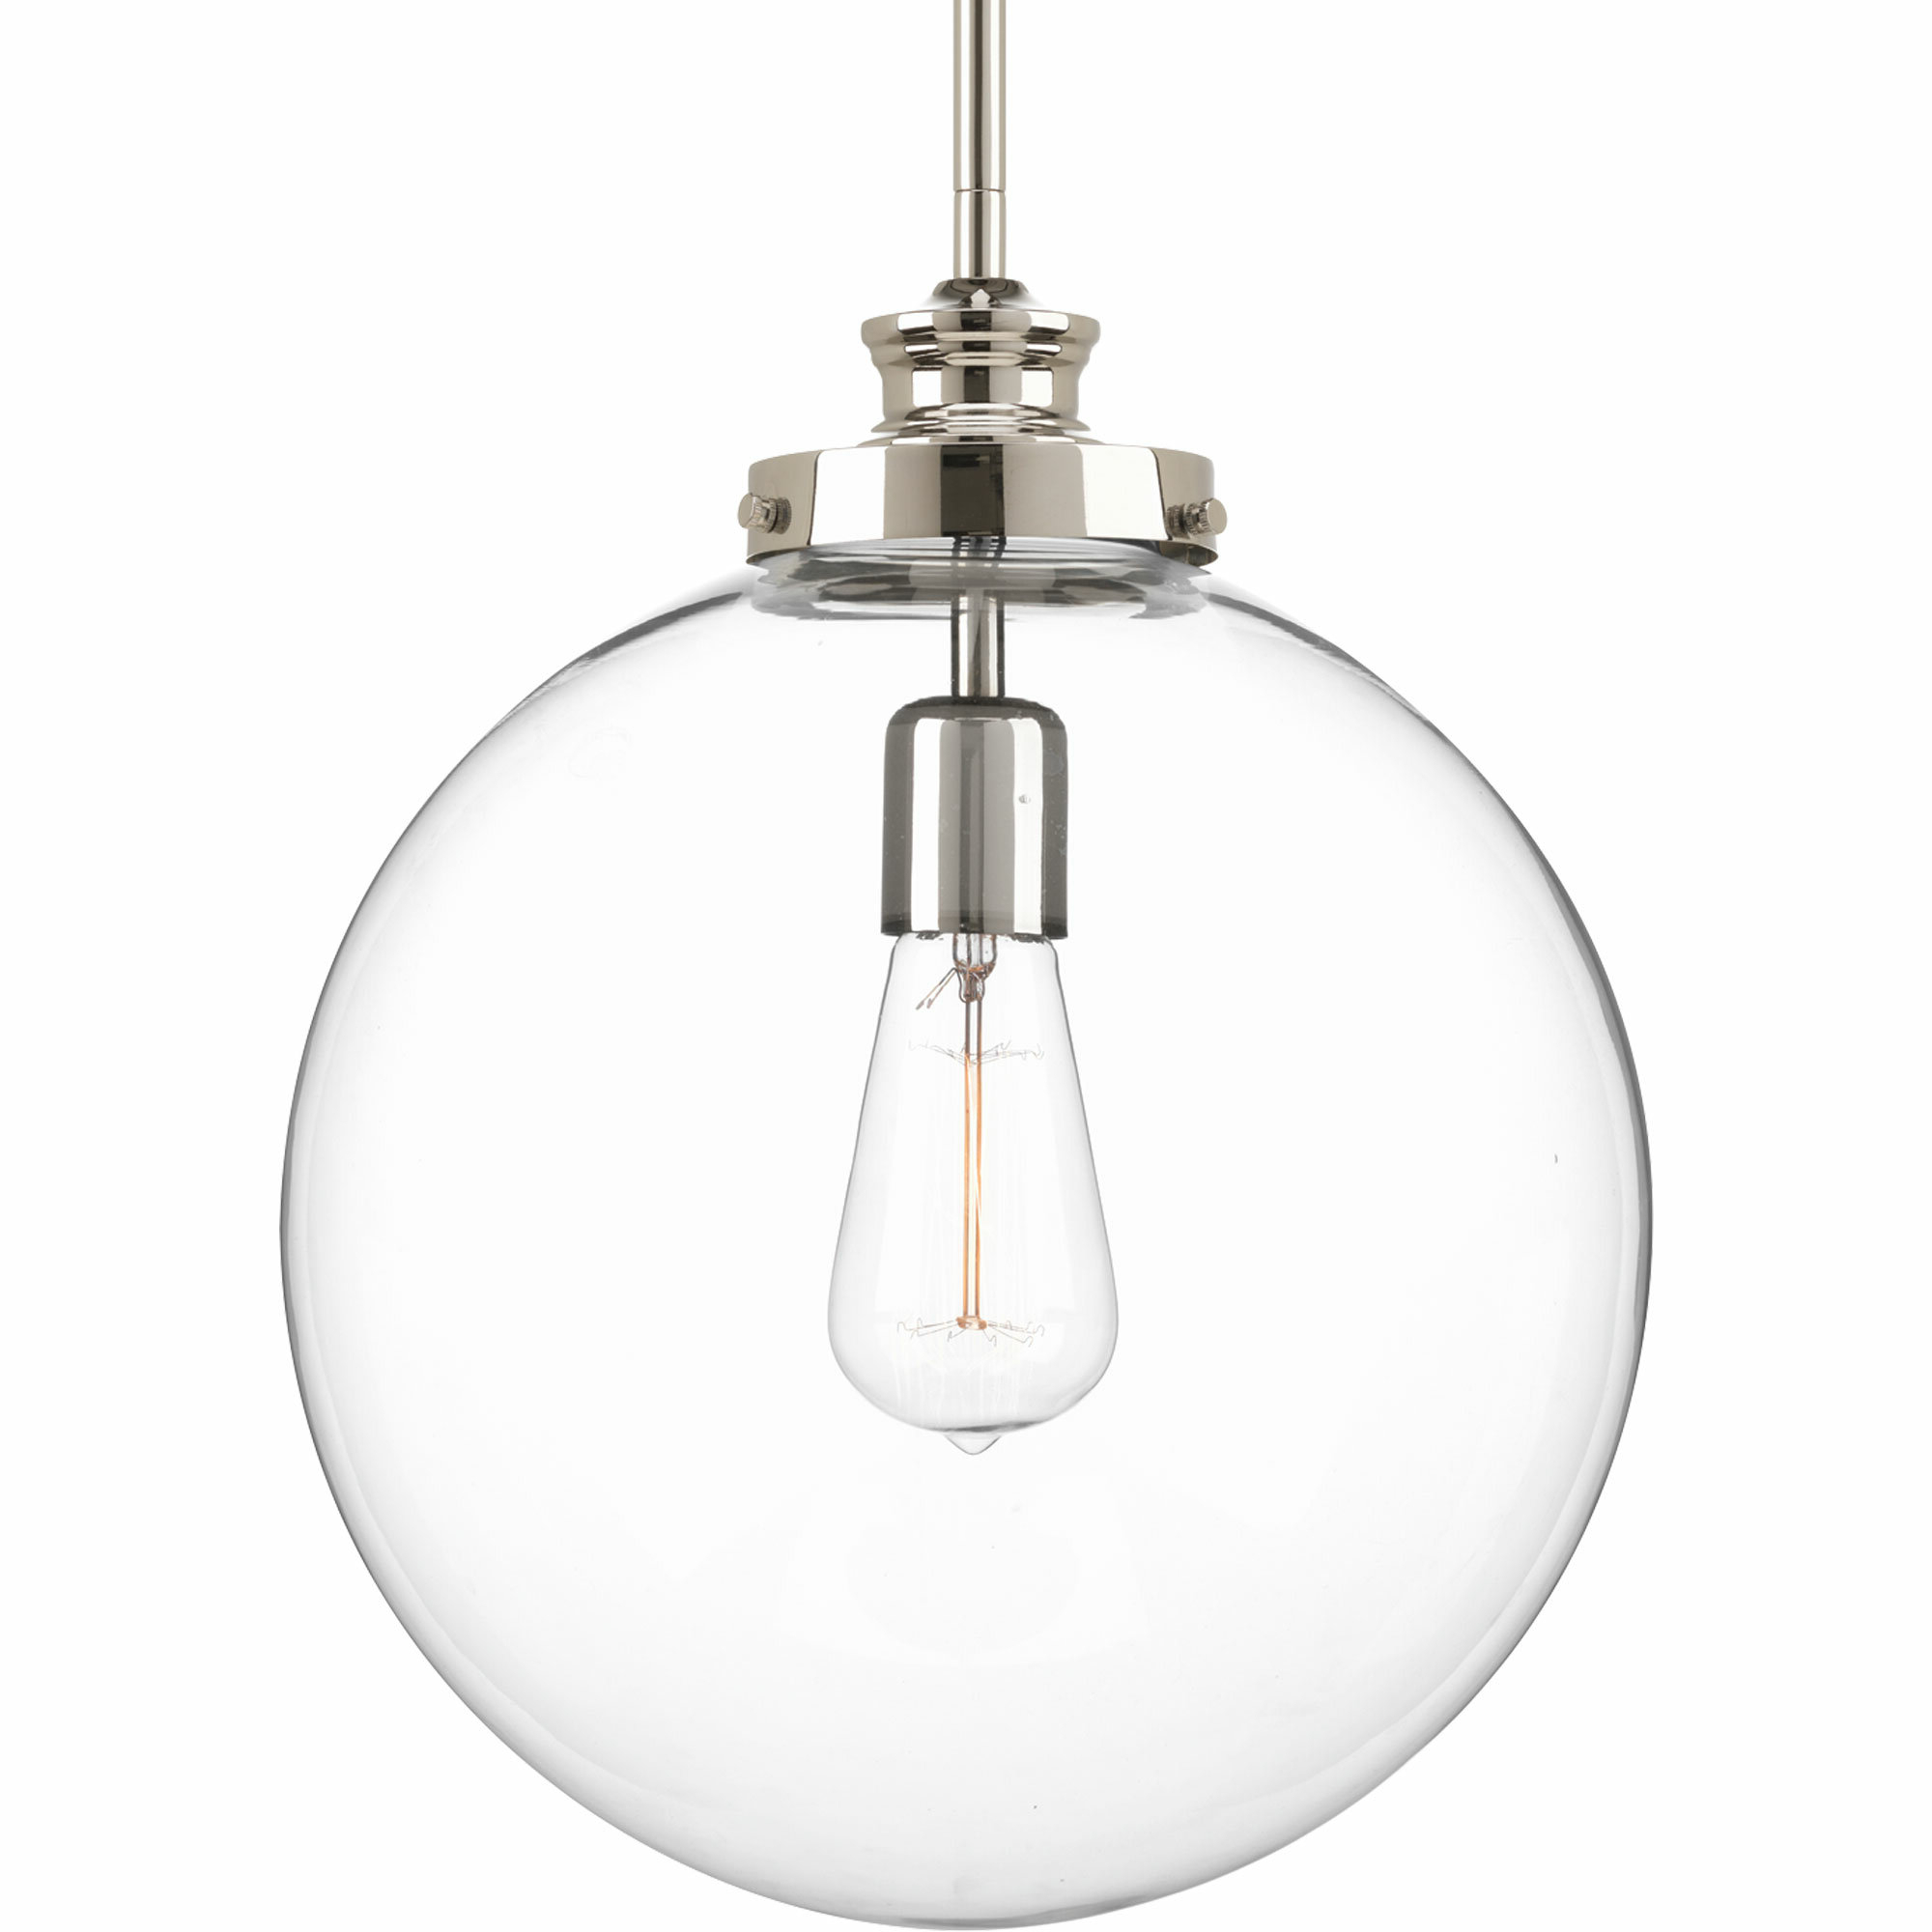 Most Popular Cayden 1 Light Single Globe Pendants Pertaining To Cayden 1 Light Single Globe Pendant (View 13 of 20)